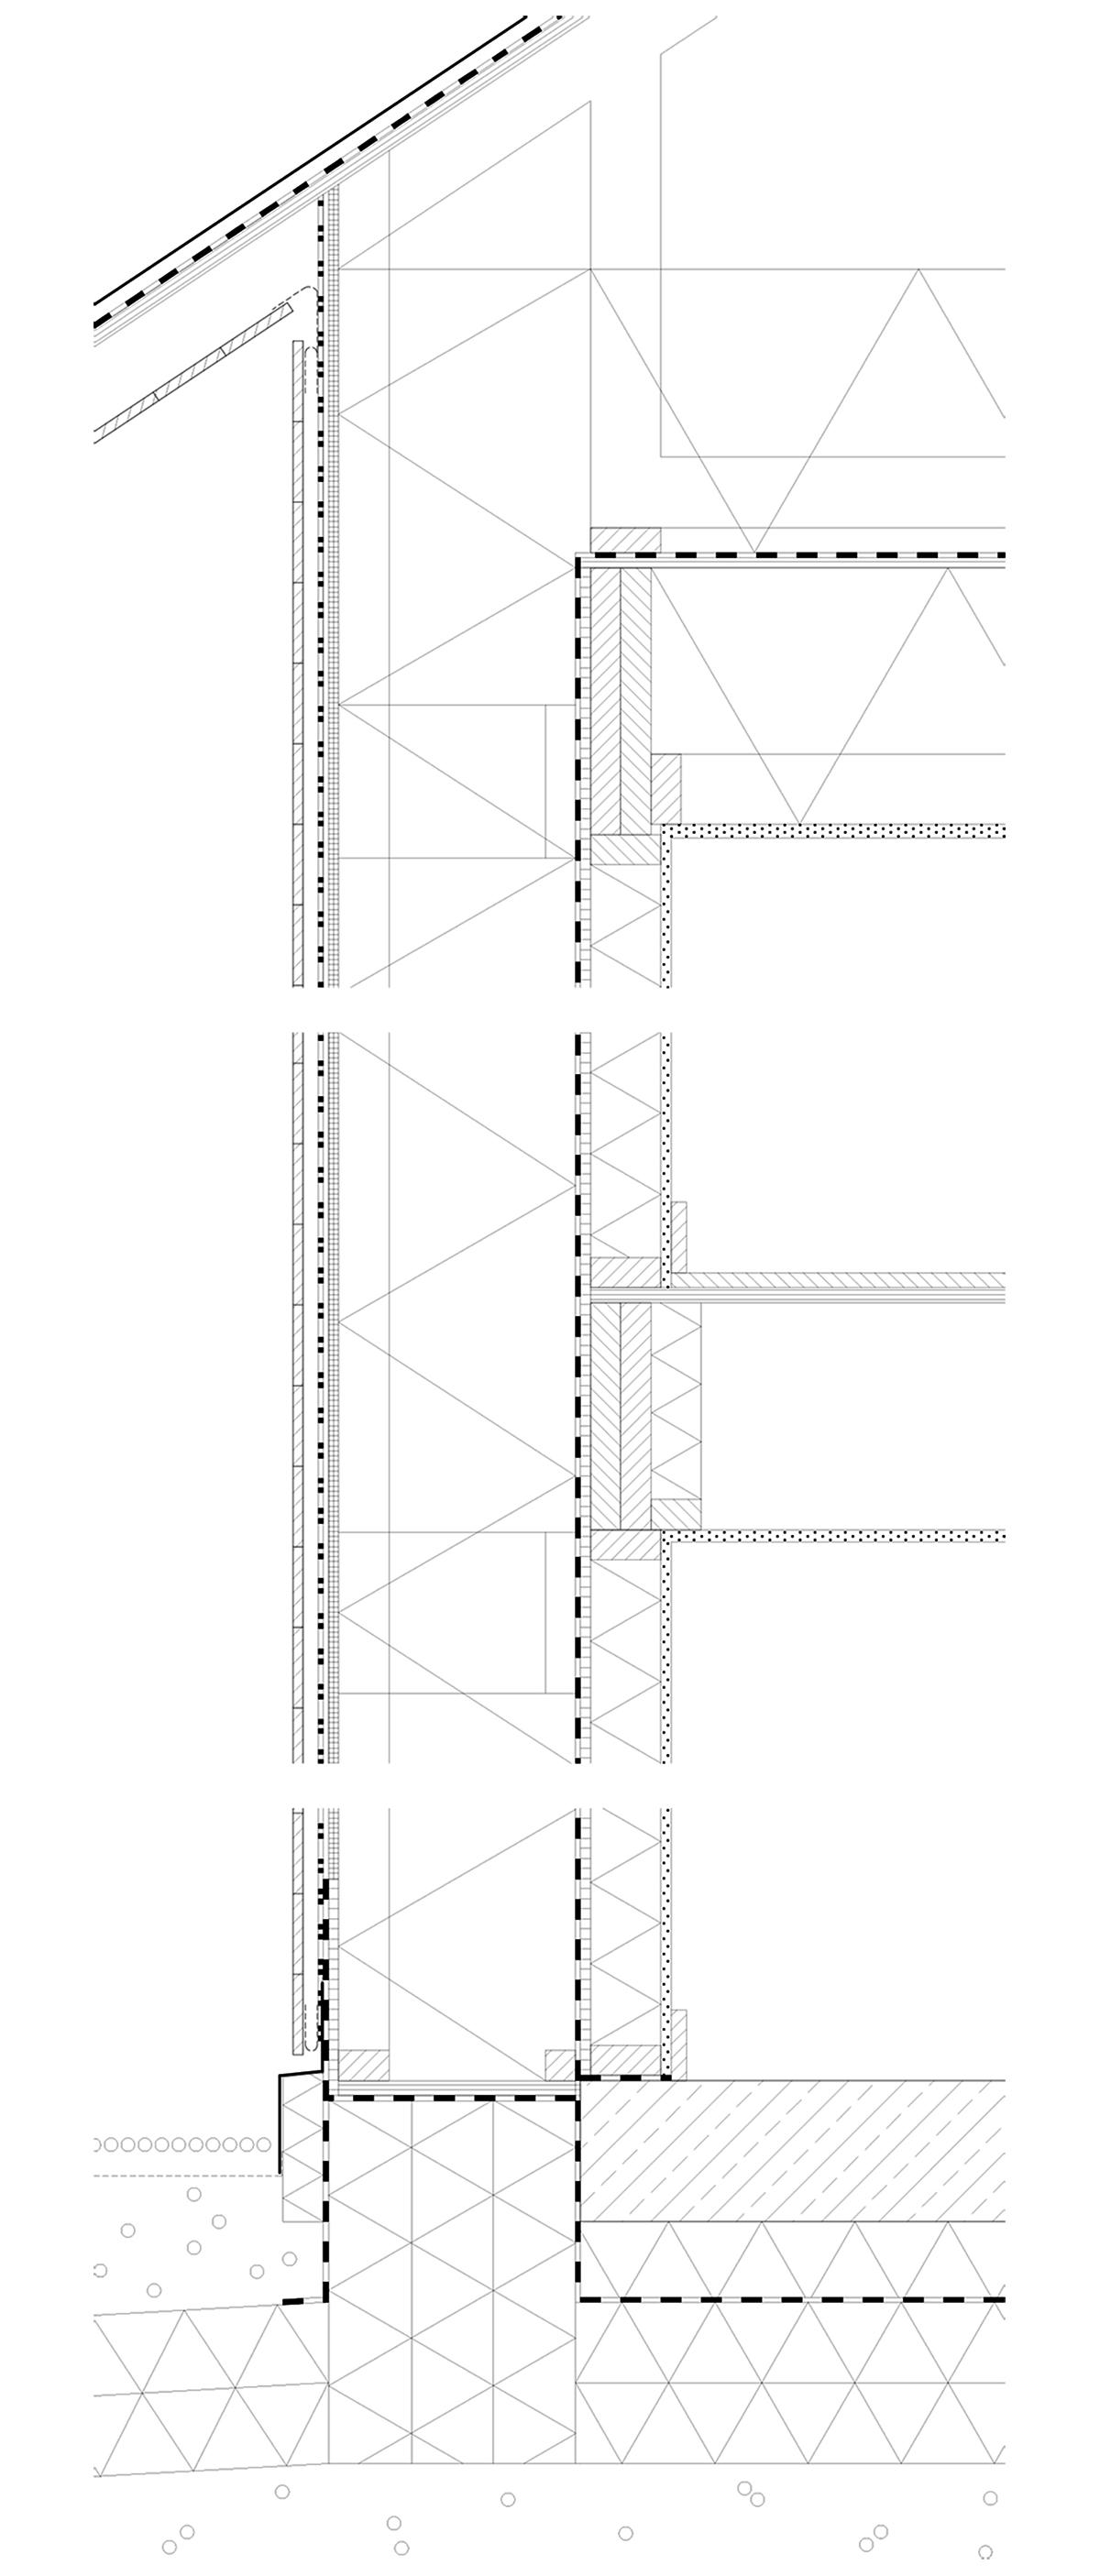 - Metrics:1775 total sq. feet33 kBtu(sqft.yr) 104 kWh(sqm.yr) pEUI source before PV12.6 kBtu(sqft.yr) 40 kWh(sqm.yr) pEUI site before PV  3.8 kBtu(sqft.yr) 12 kWh(sqm.yr) space heat demand0.51 ACH50 pressurization testR-60  0.094 W(sqm.k) wallR-94  0.060 W(sqm.k) roofR-57  0.100 W(sqm.k) slab foundationR-4  1.31 W(sqm.k) window frameR-8  0.75 W(sqm.k) window glass56% SHGC92% heat recovery efficiencyCertifications:Certified Passive House (PHI-Germany)LEED for HomesEnergy StarPublications/Exhibits/Presentations:Certified Passive House Designer - 2015Int'l Passive House Conference Publication - 2012Int'l Passive House Conference Lecture - 2012International Passive House Database #2173Mother Earth Living Magazine - 2011Green Building Advisor - 2011TreeHugger - 2014Inhabitat - 2014La Crosse Tribune - Mar 18 2012Information/Contact:www.coulson.coinfo@coulson.cowww.madisonenvironmental.comdownload project pdf© 2011 COULSON